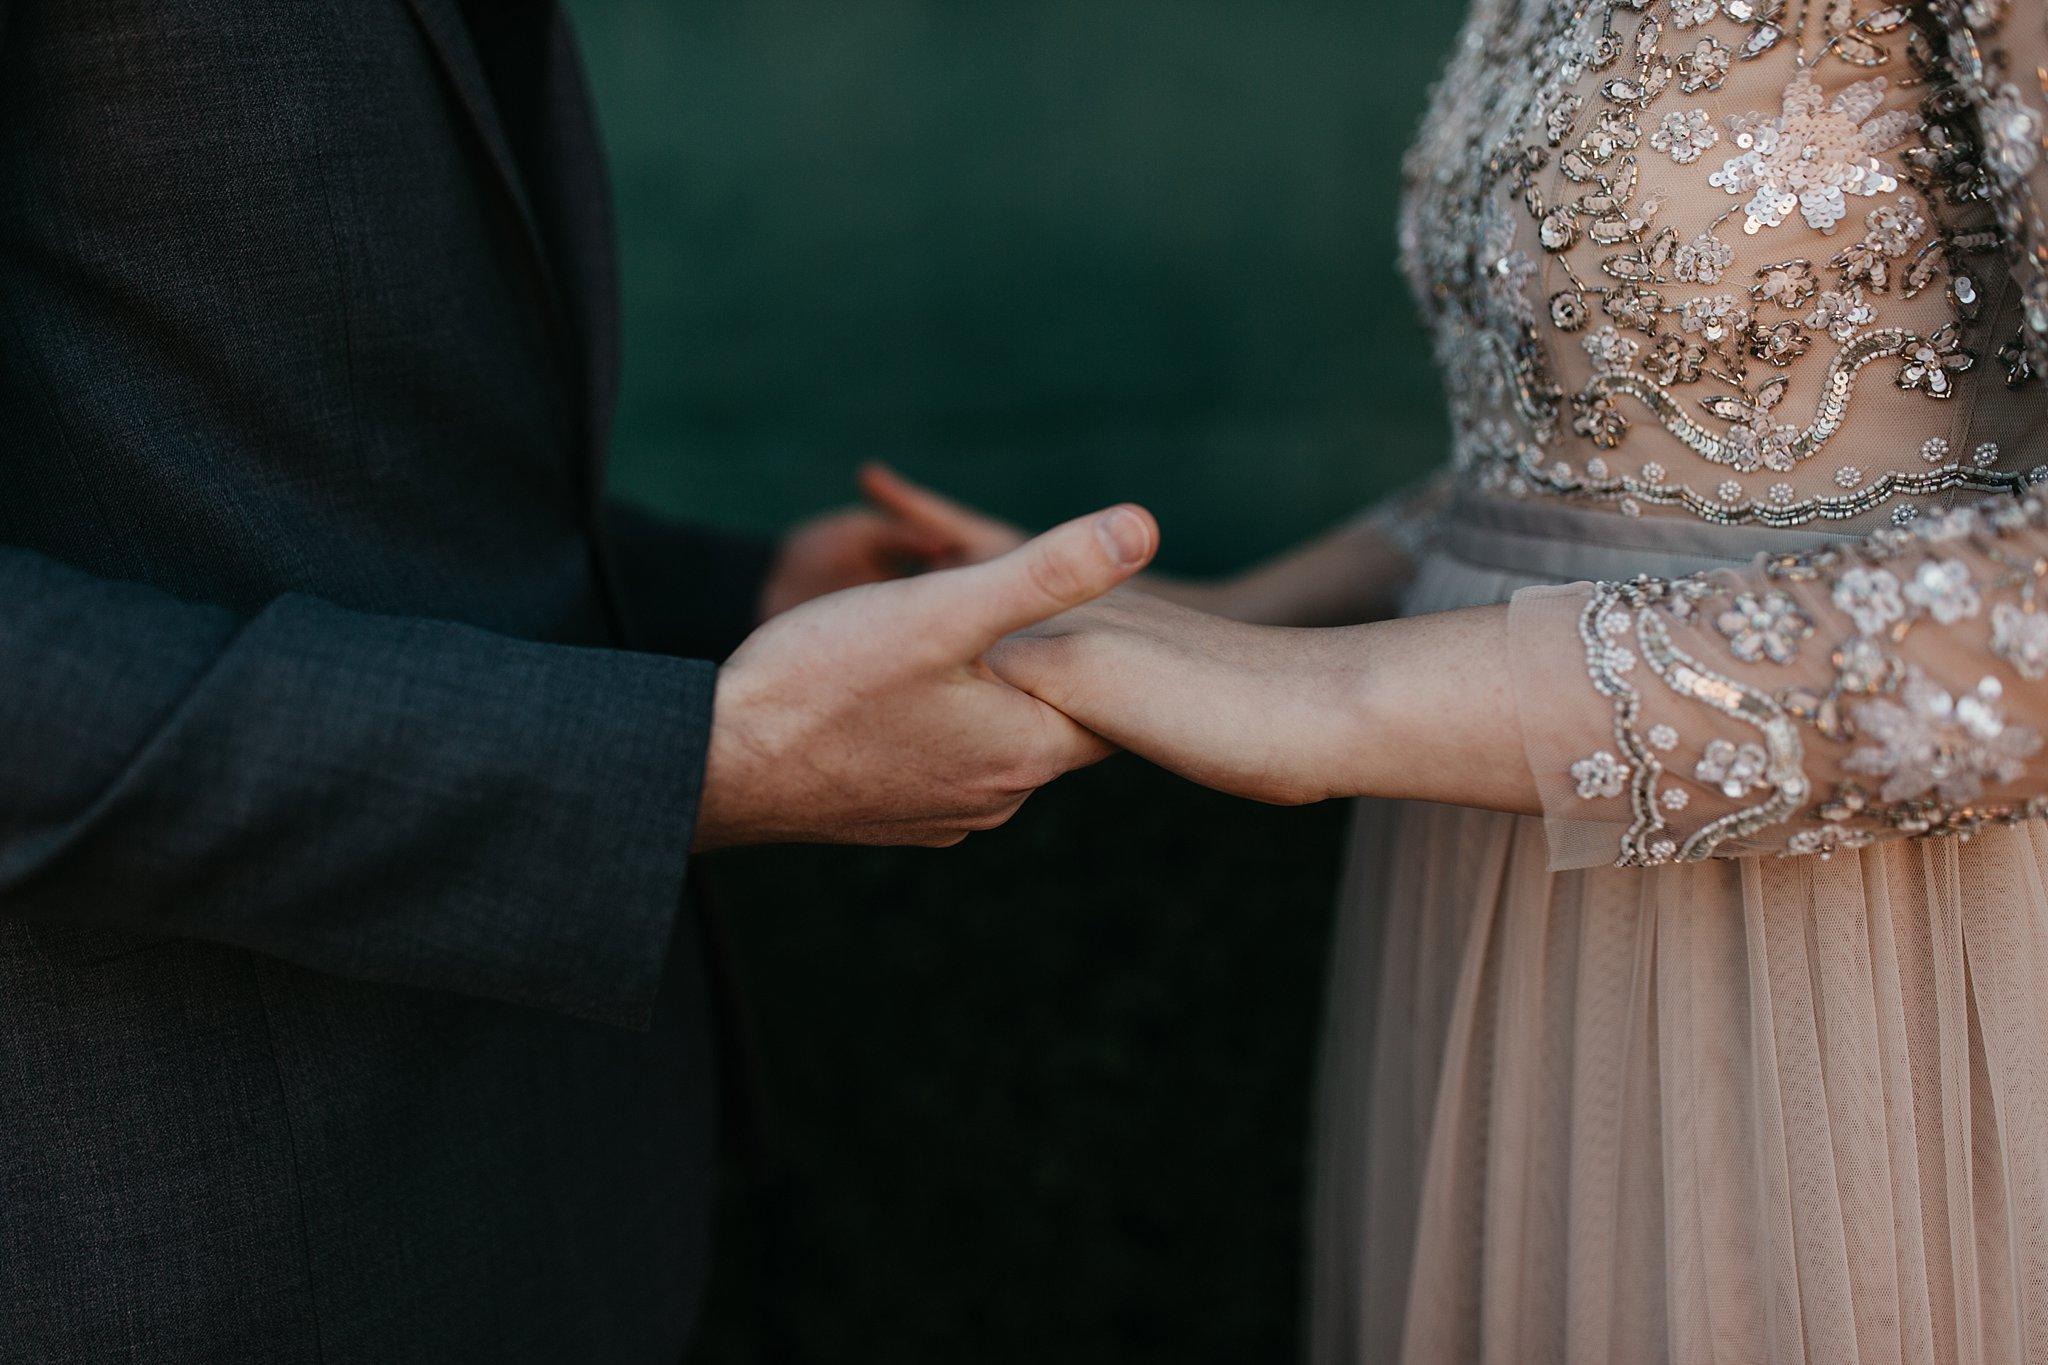 Wilderlove Co_Waco Texas_The Phoenix_Romantic Wedding Photography_0027.jpg